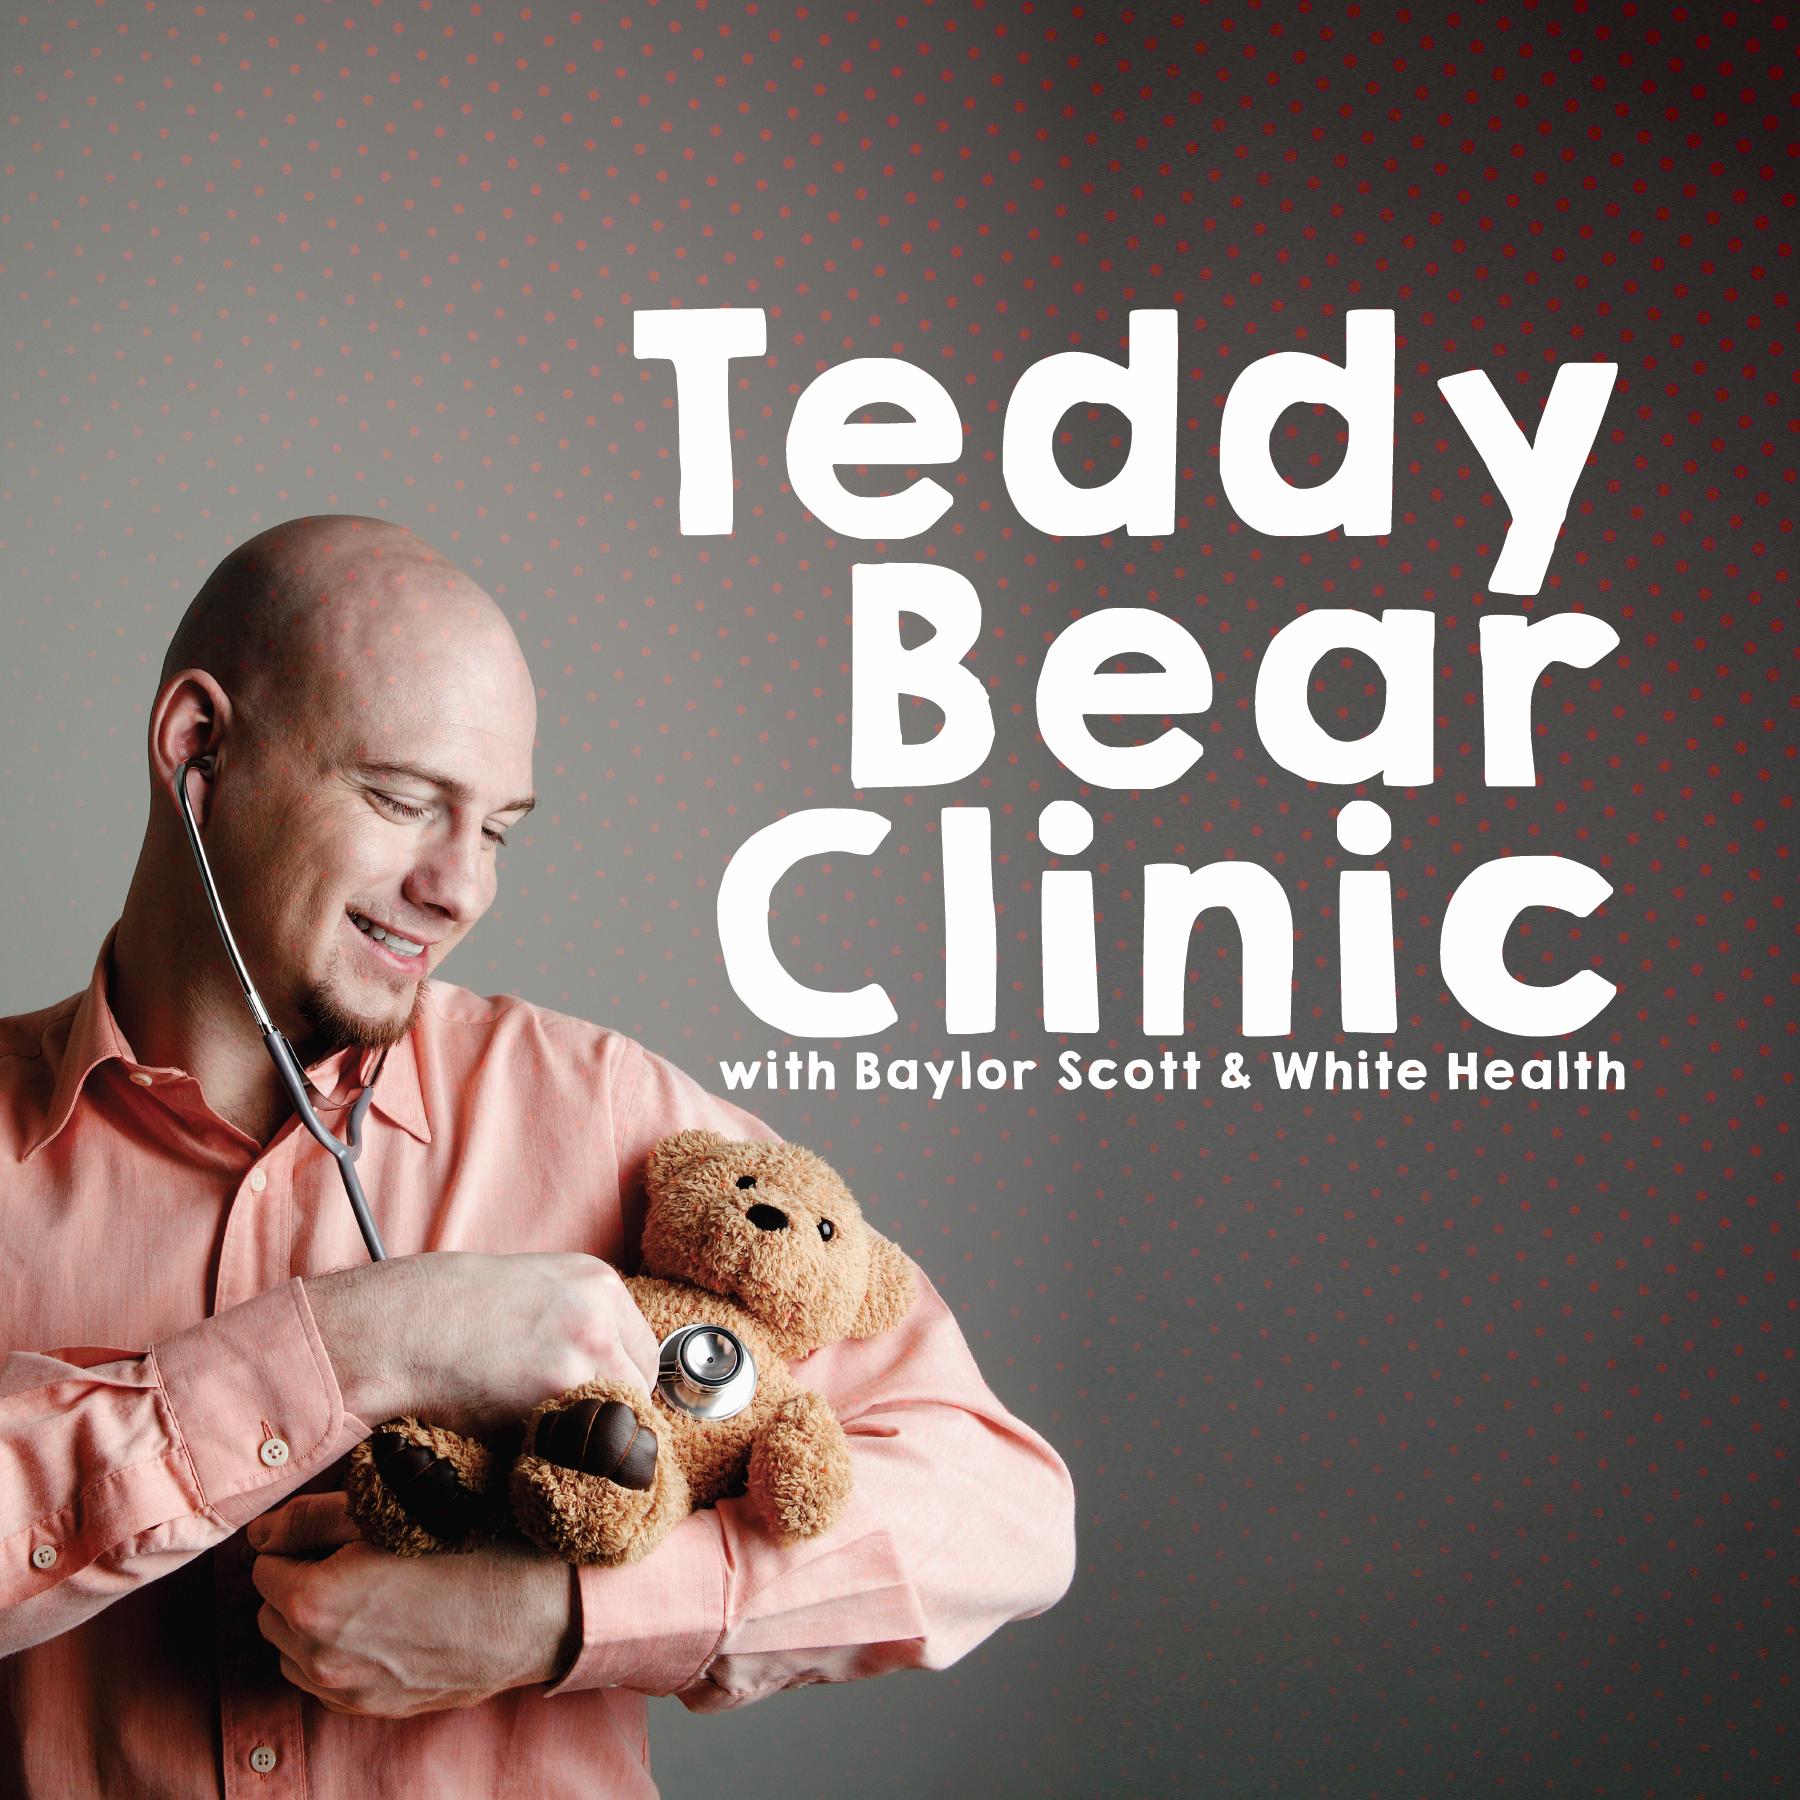 Teddy Bear Clinic Sponsored by Baylor Scott & White Hillcrest Pediatric Clinic